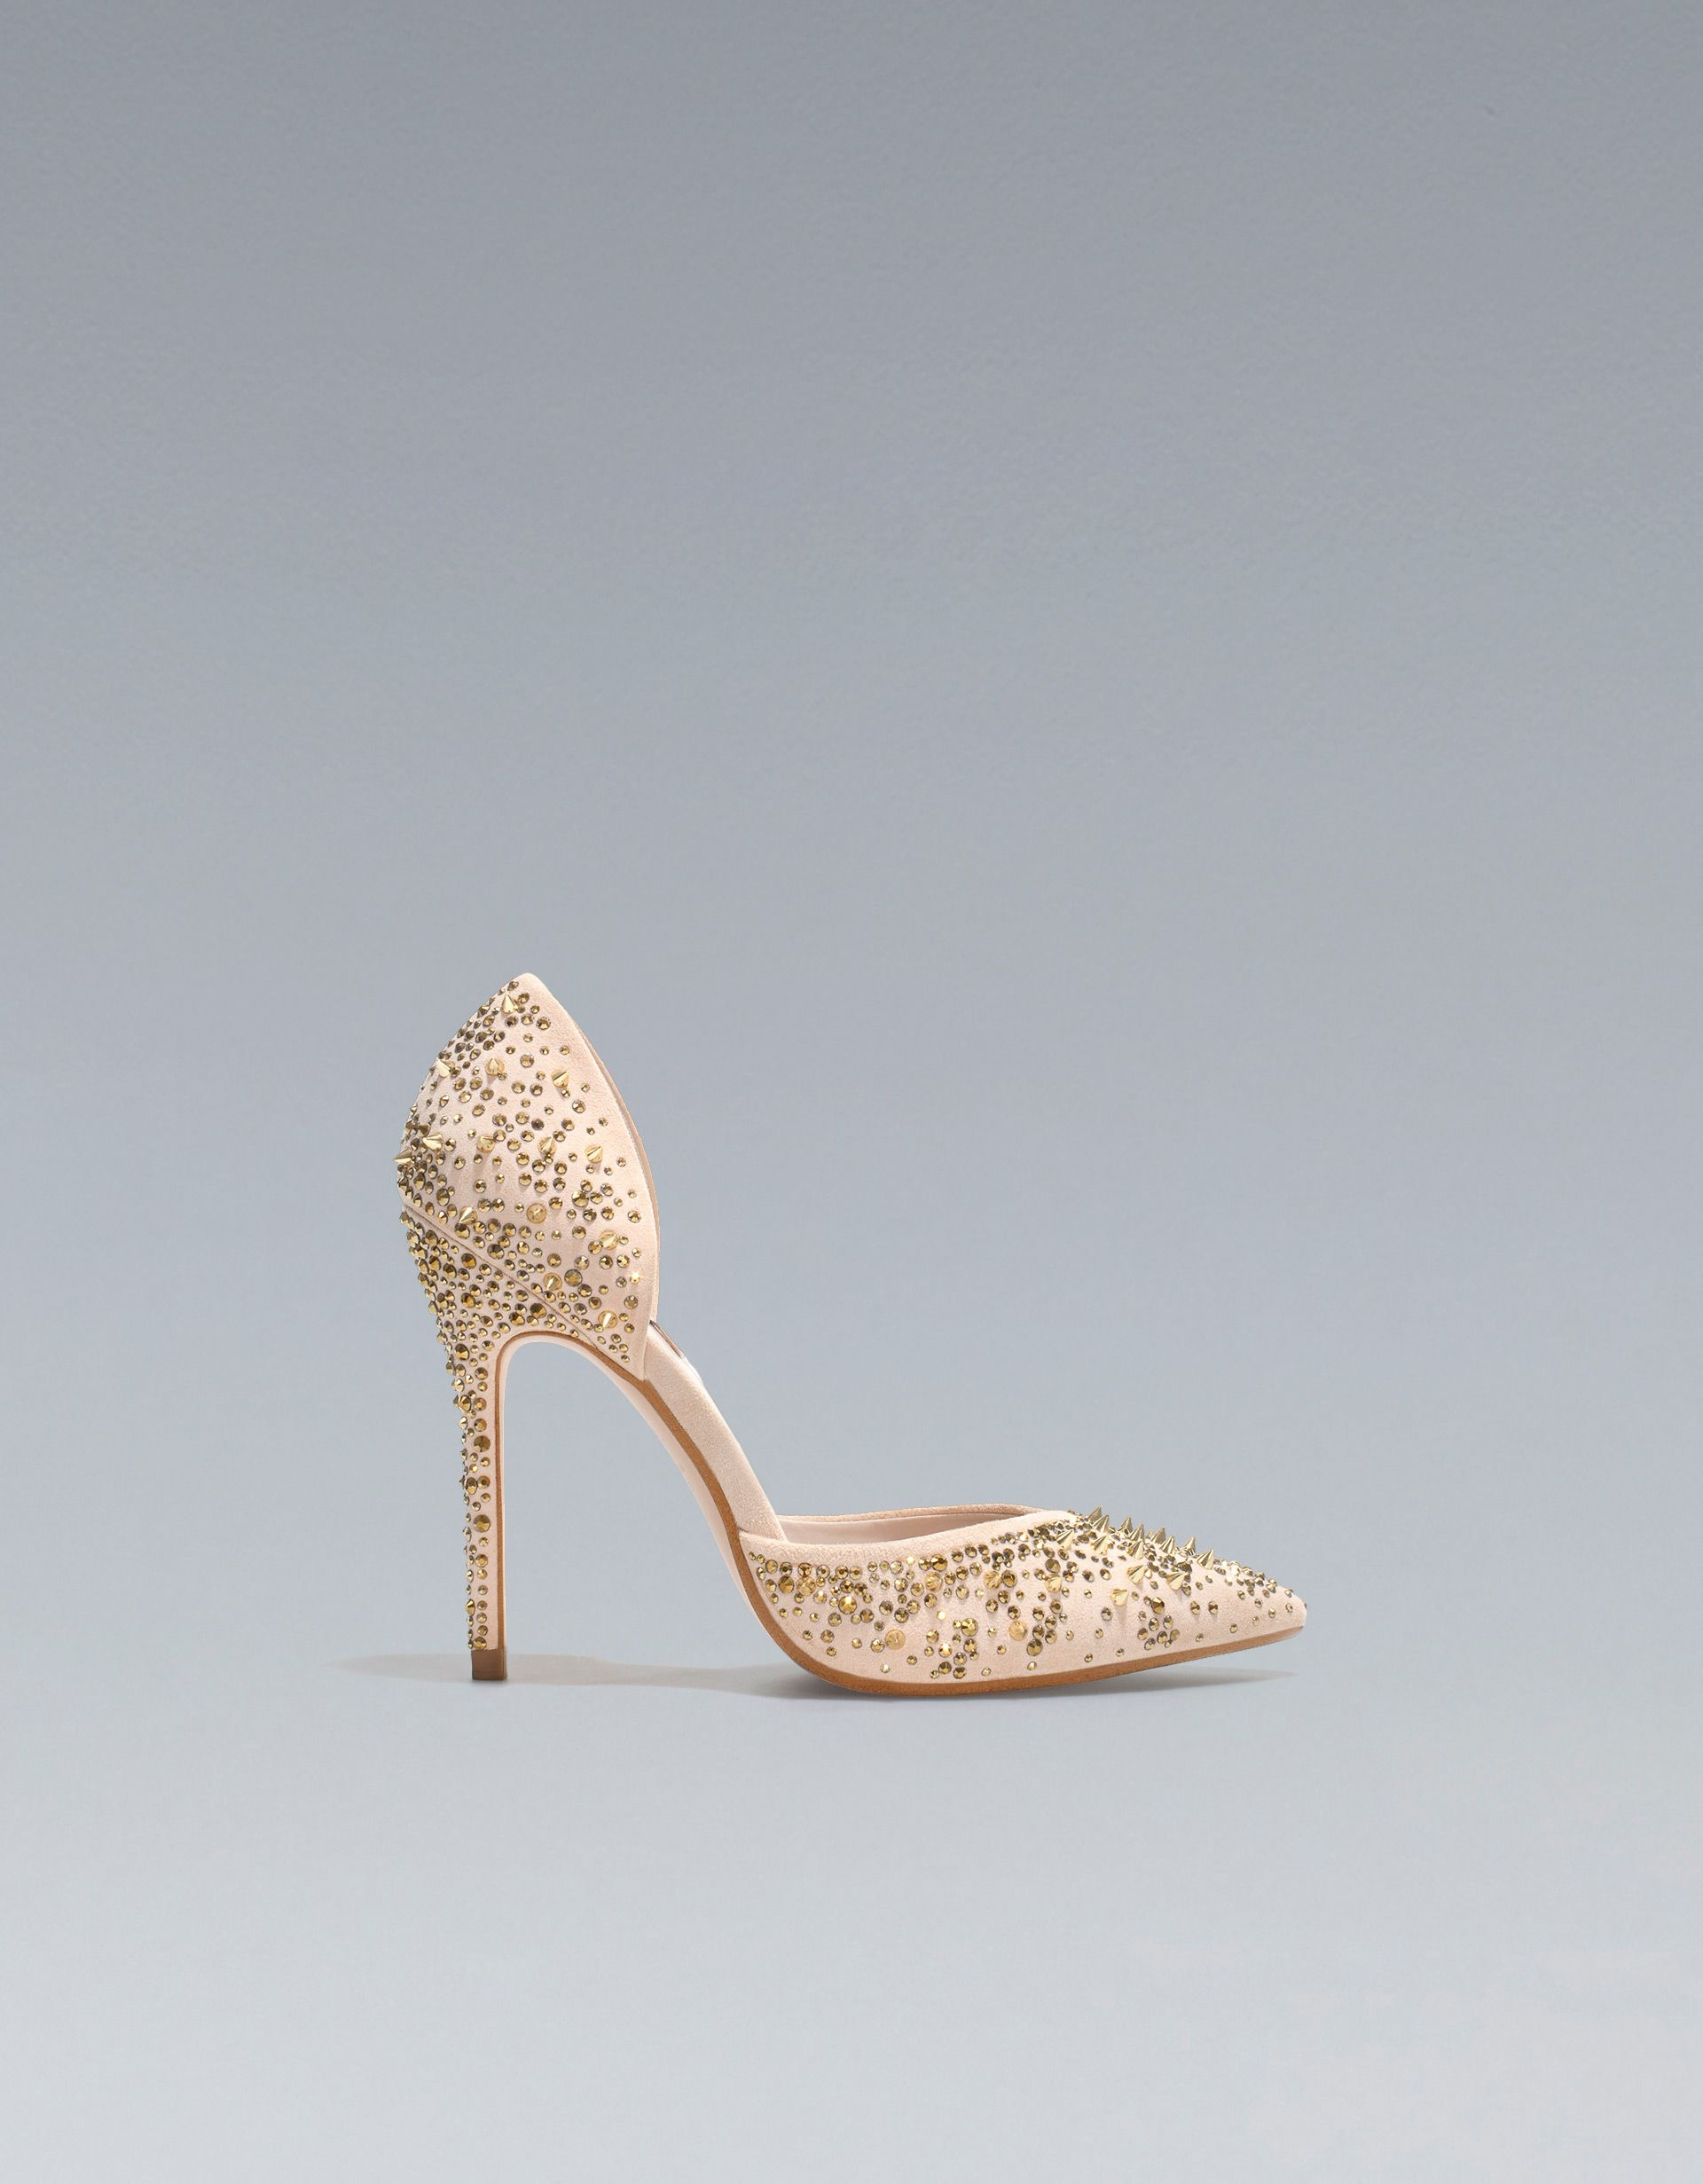 2d4a006b PALA TALÓN TACHAS - Zapatos - Mujer - Nueva Colección - ZARA Colombia  Zapatos De Novia